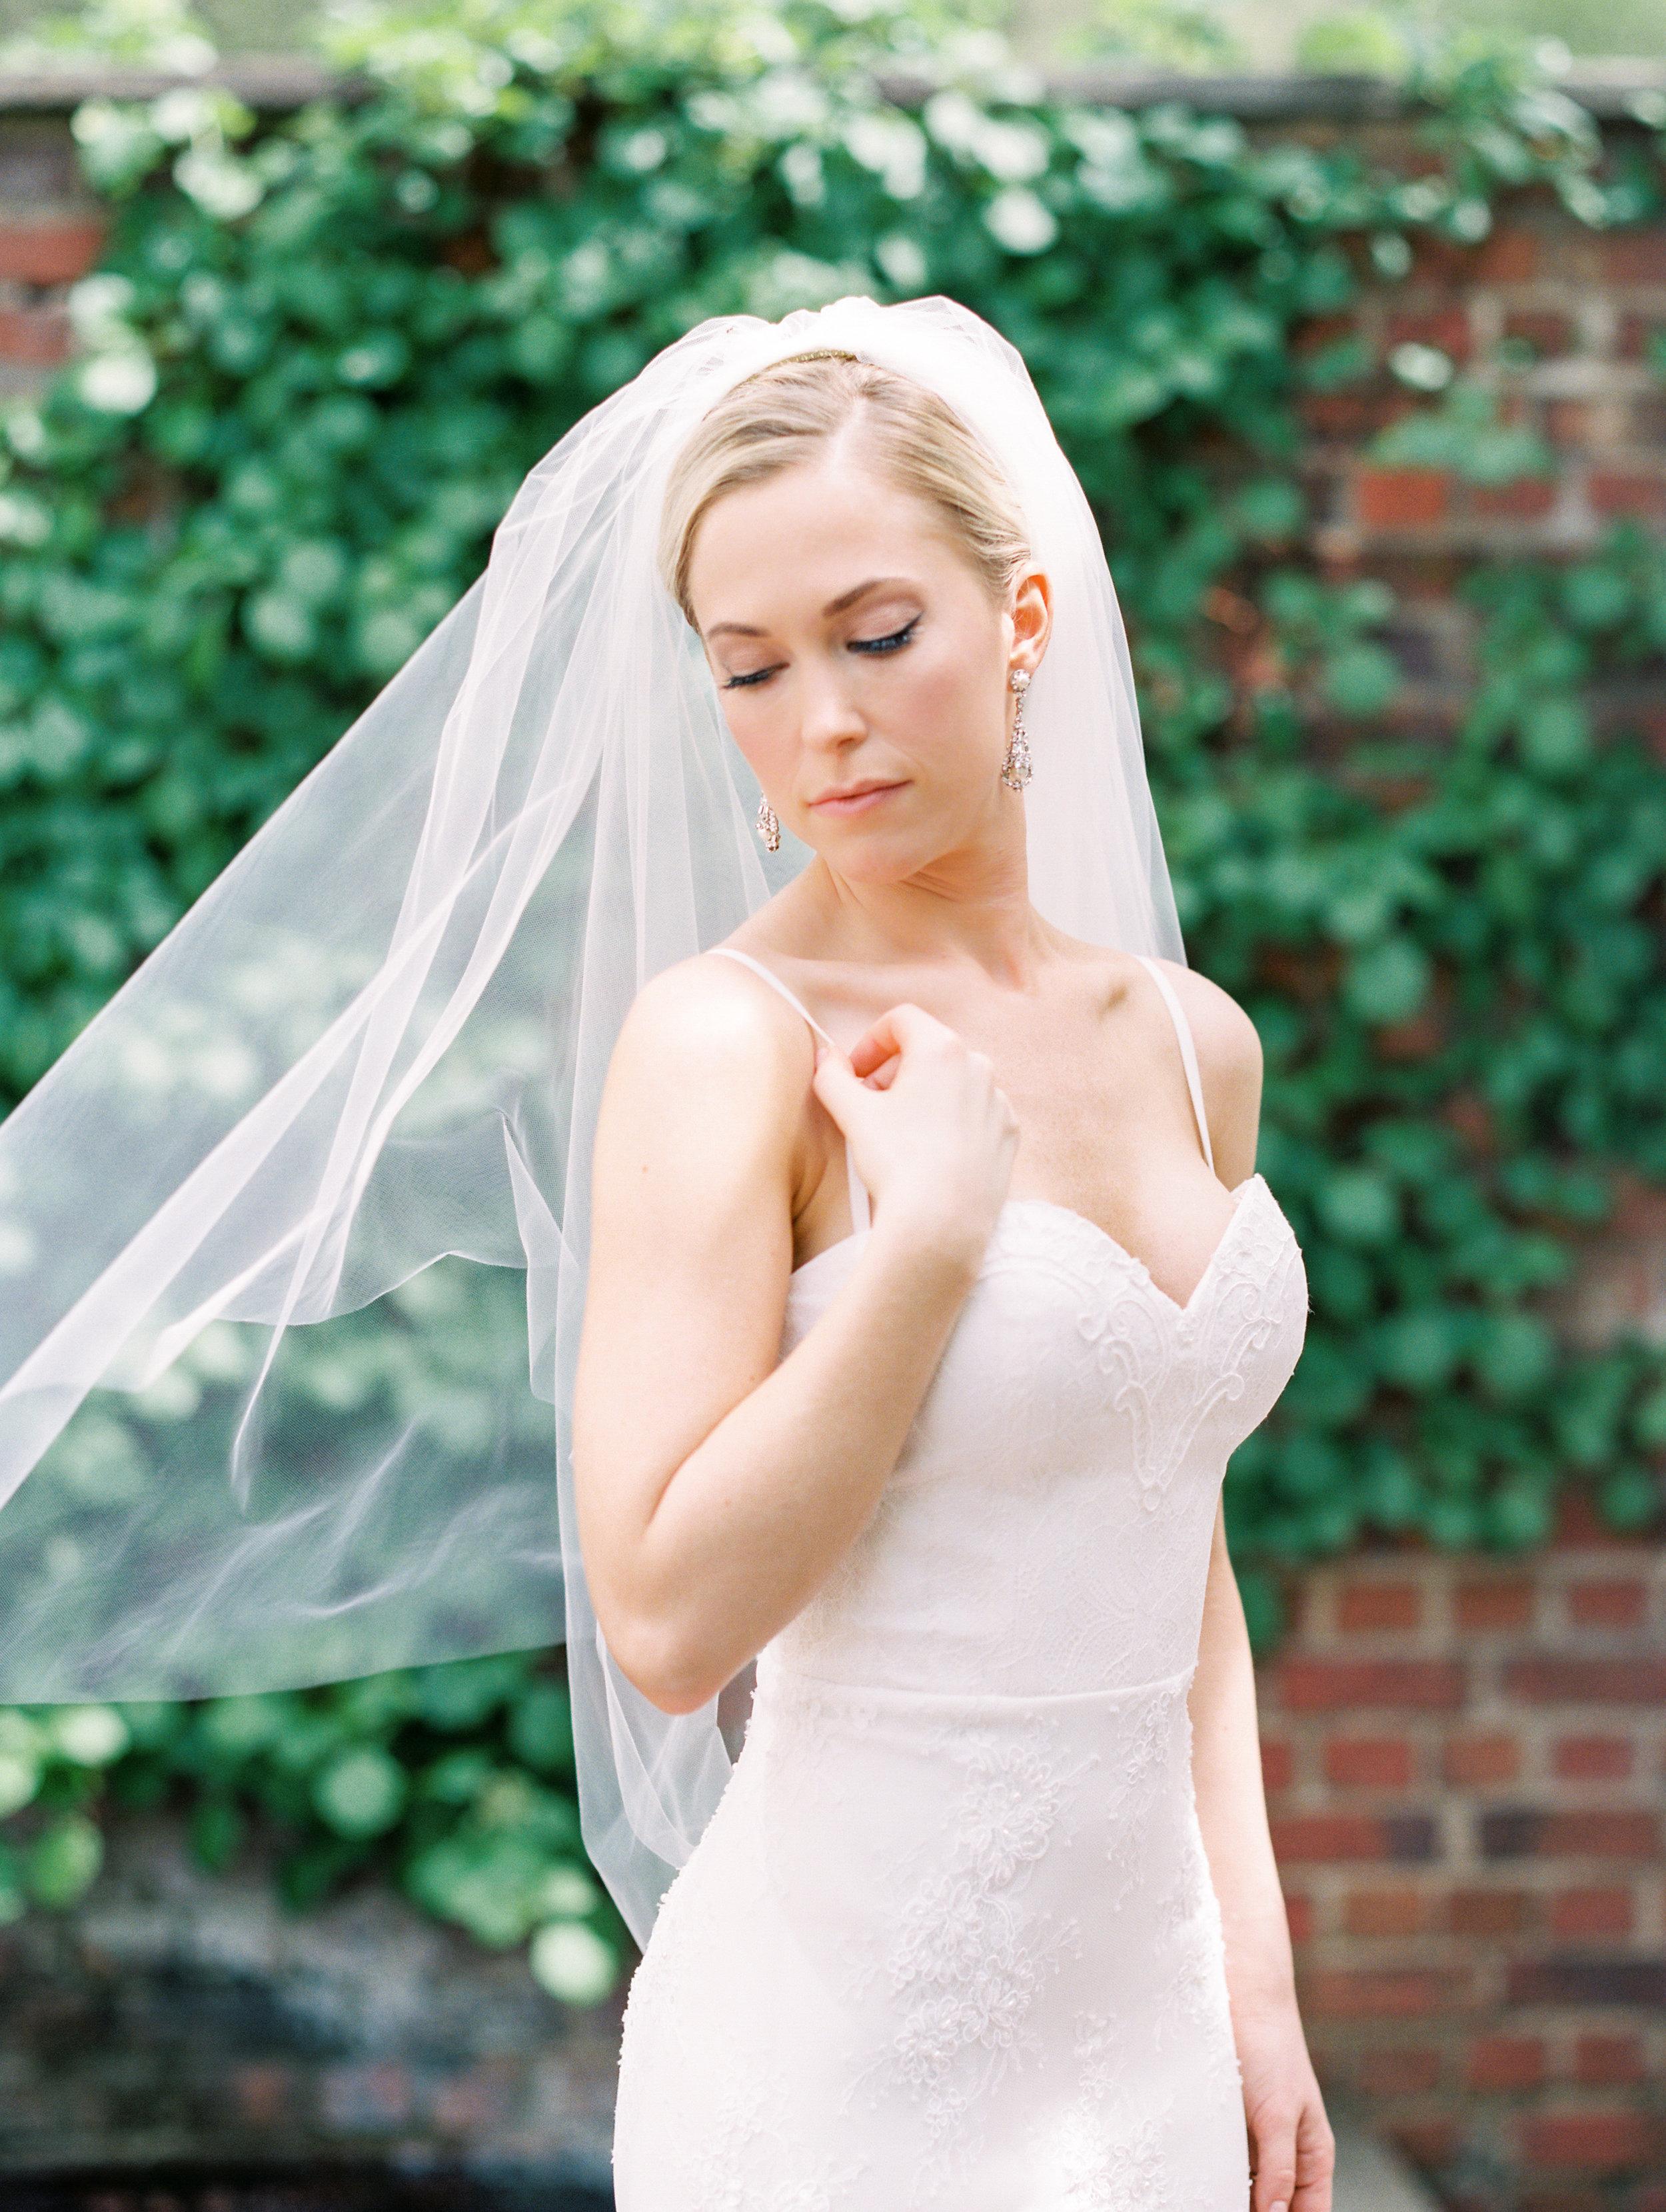 Hartnett Wedding by Michelle Lange Photography - 0258.JPG